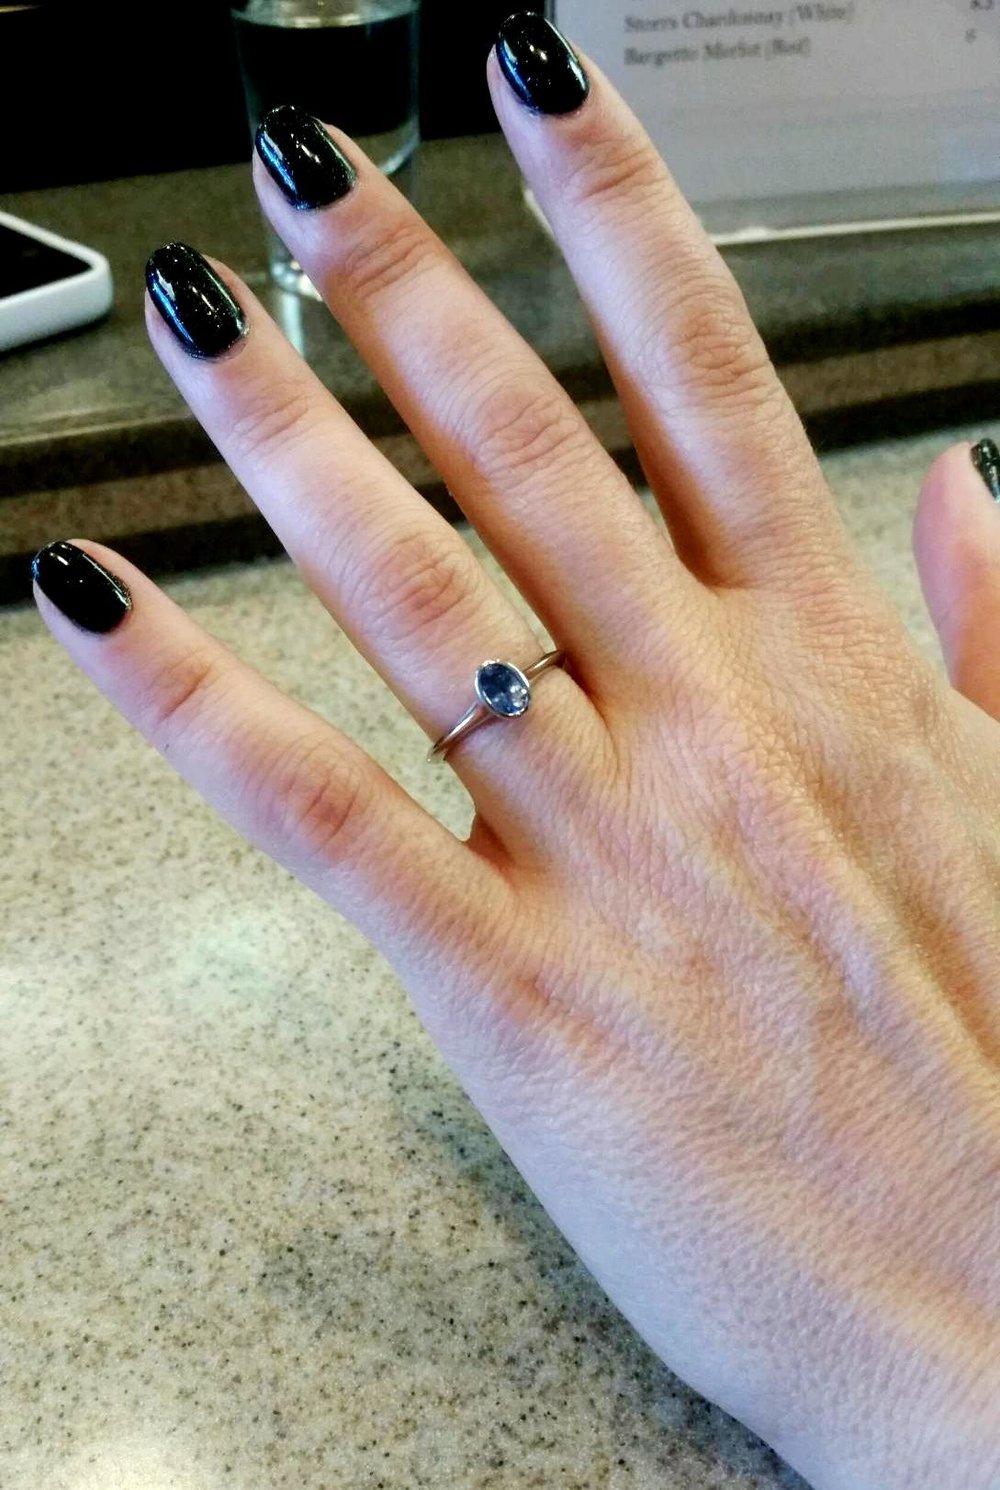 viki-wearing-montana-sapphire-ring